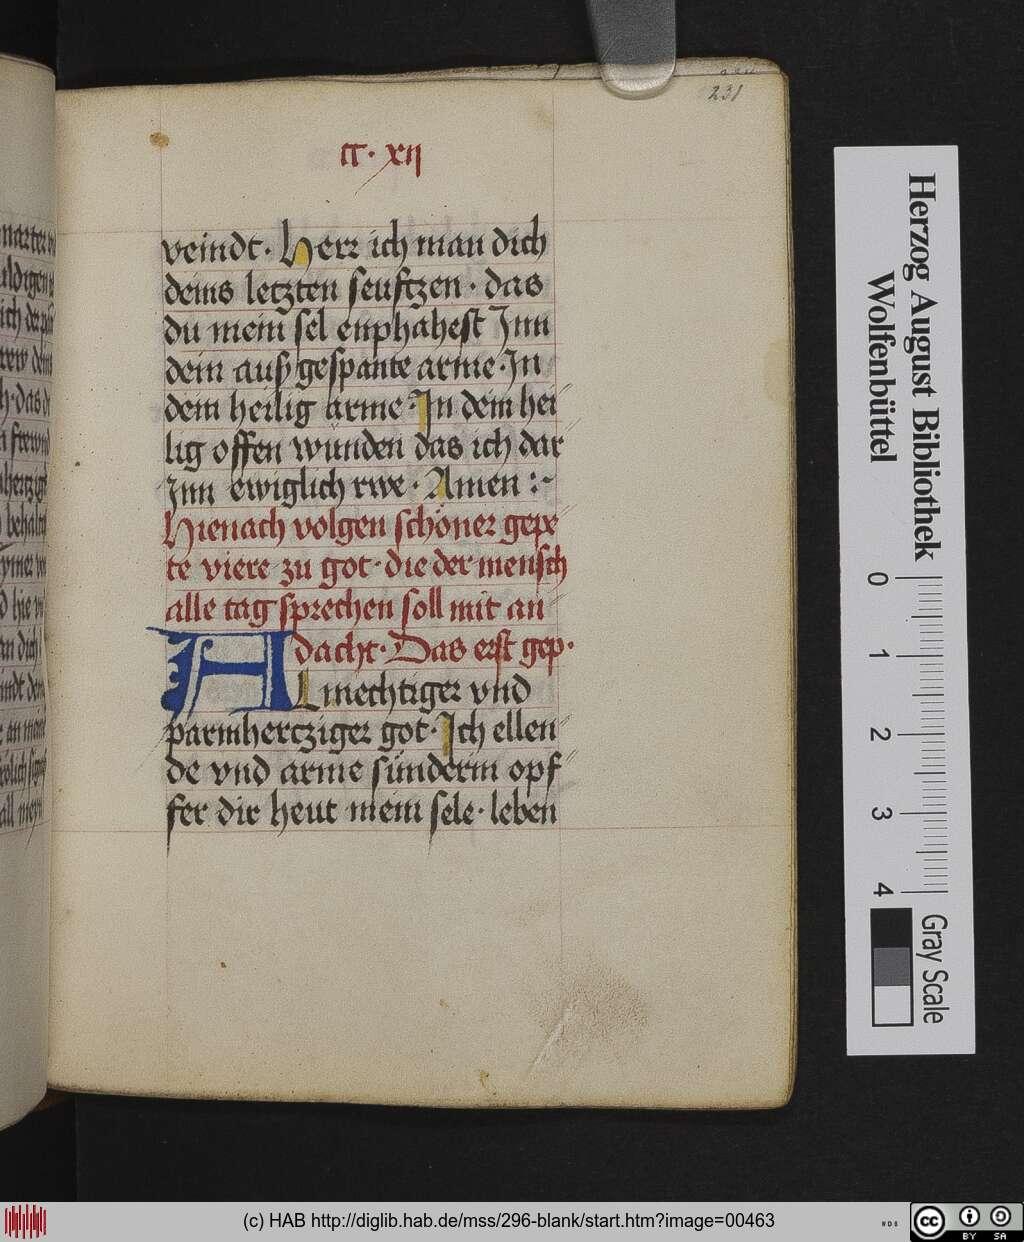 http://diglib.hab.de/mss/296-blank/00463.jpg